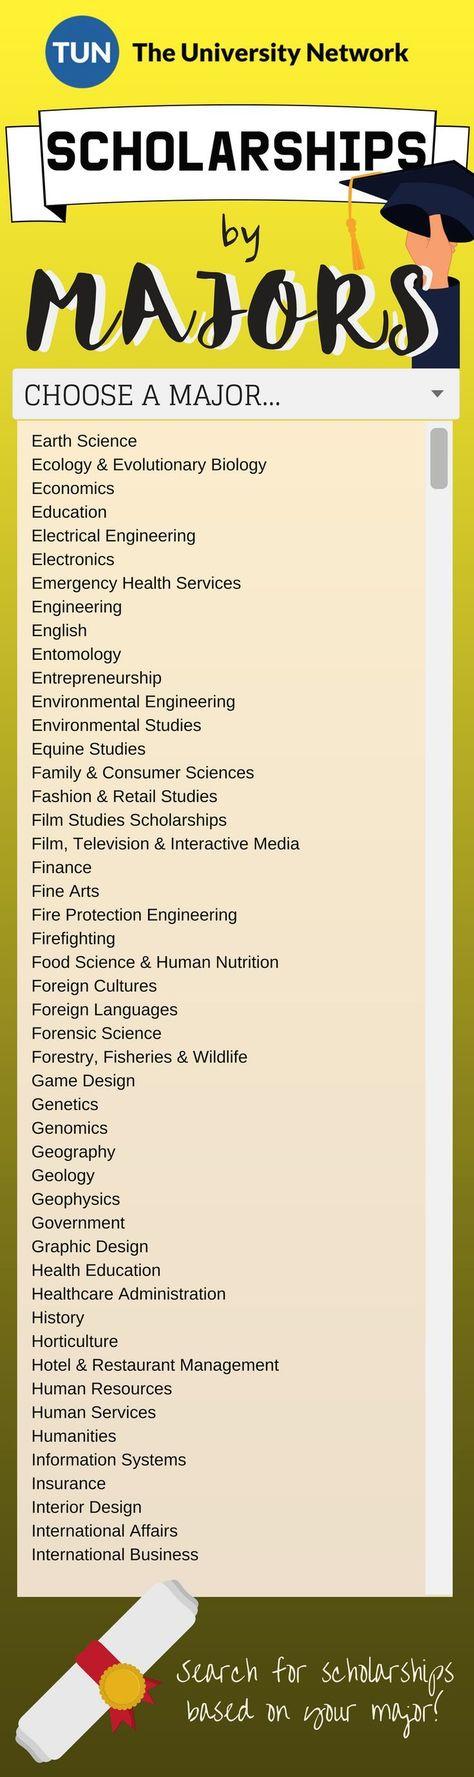 Major Scholarship Articles scholarships